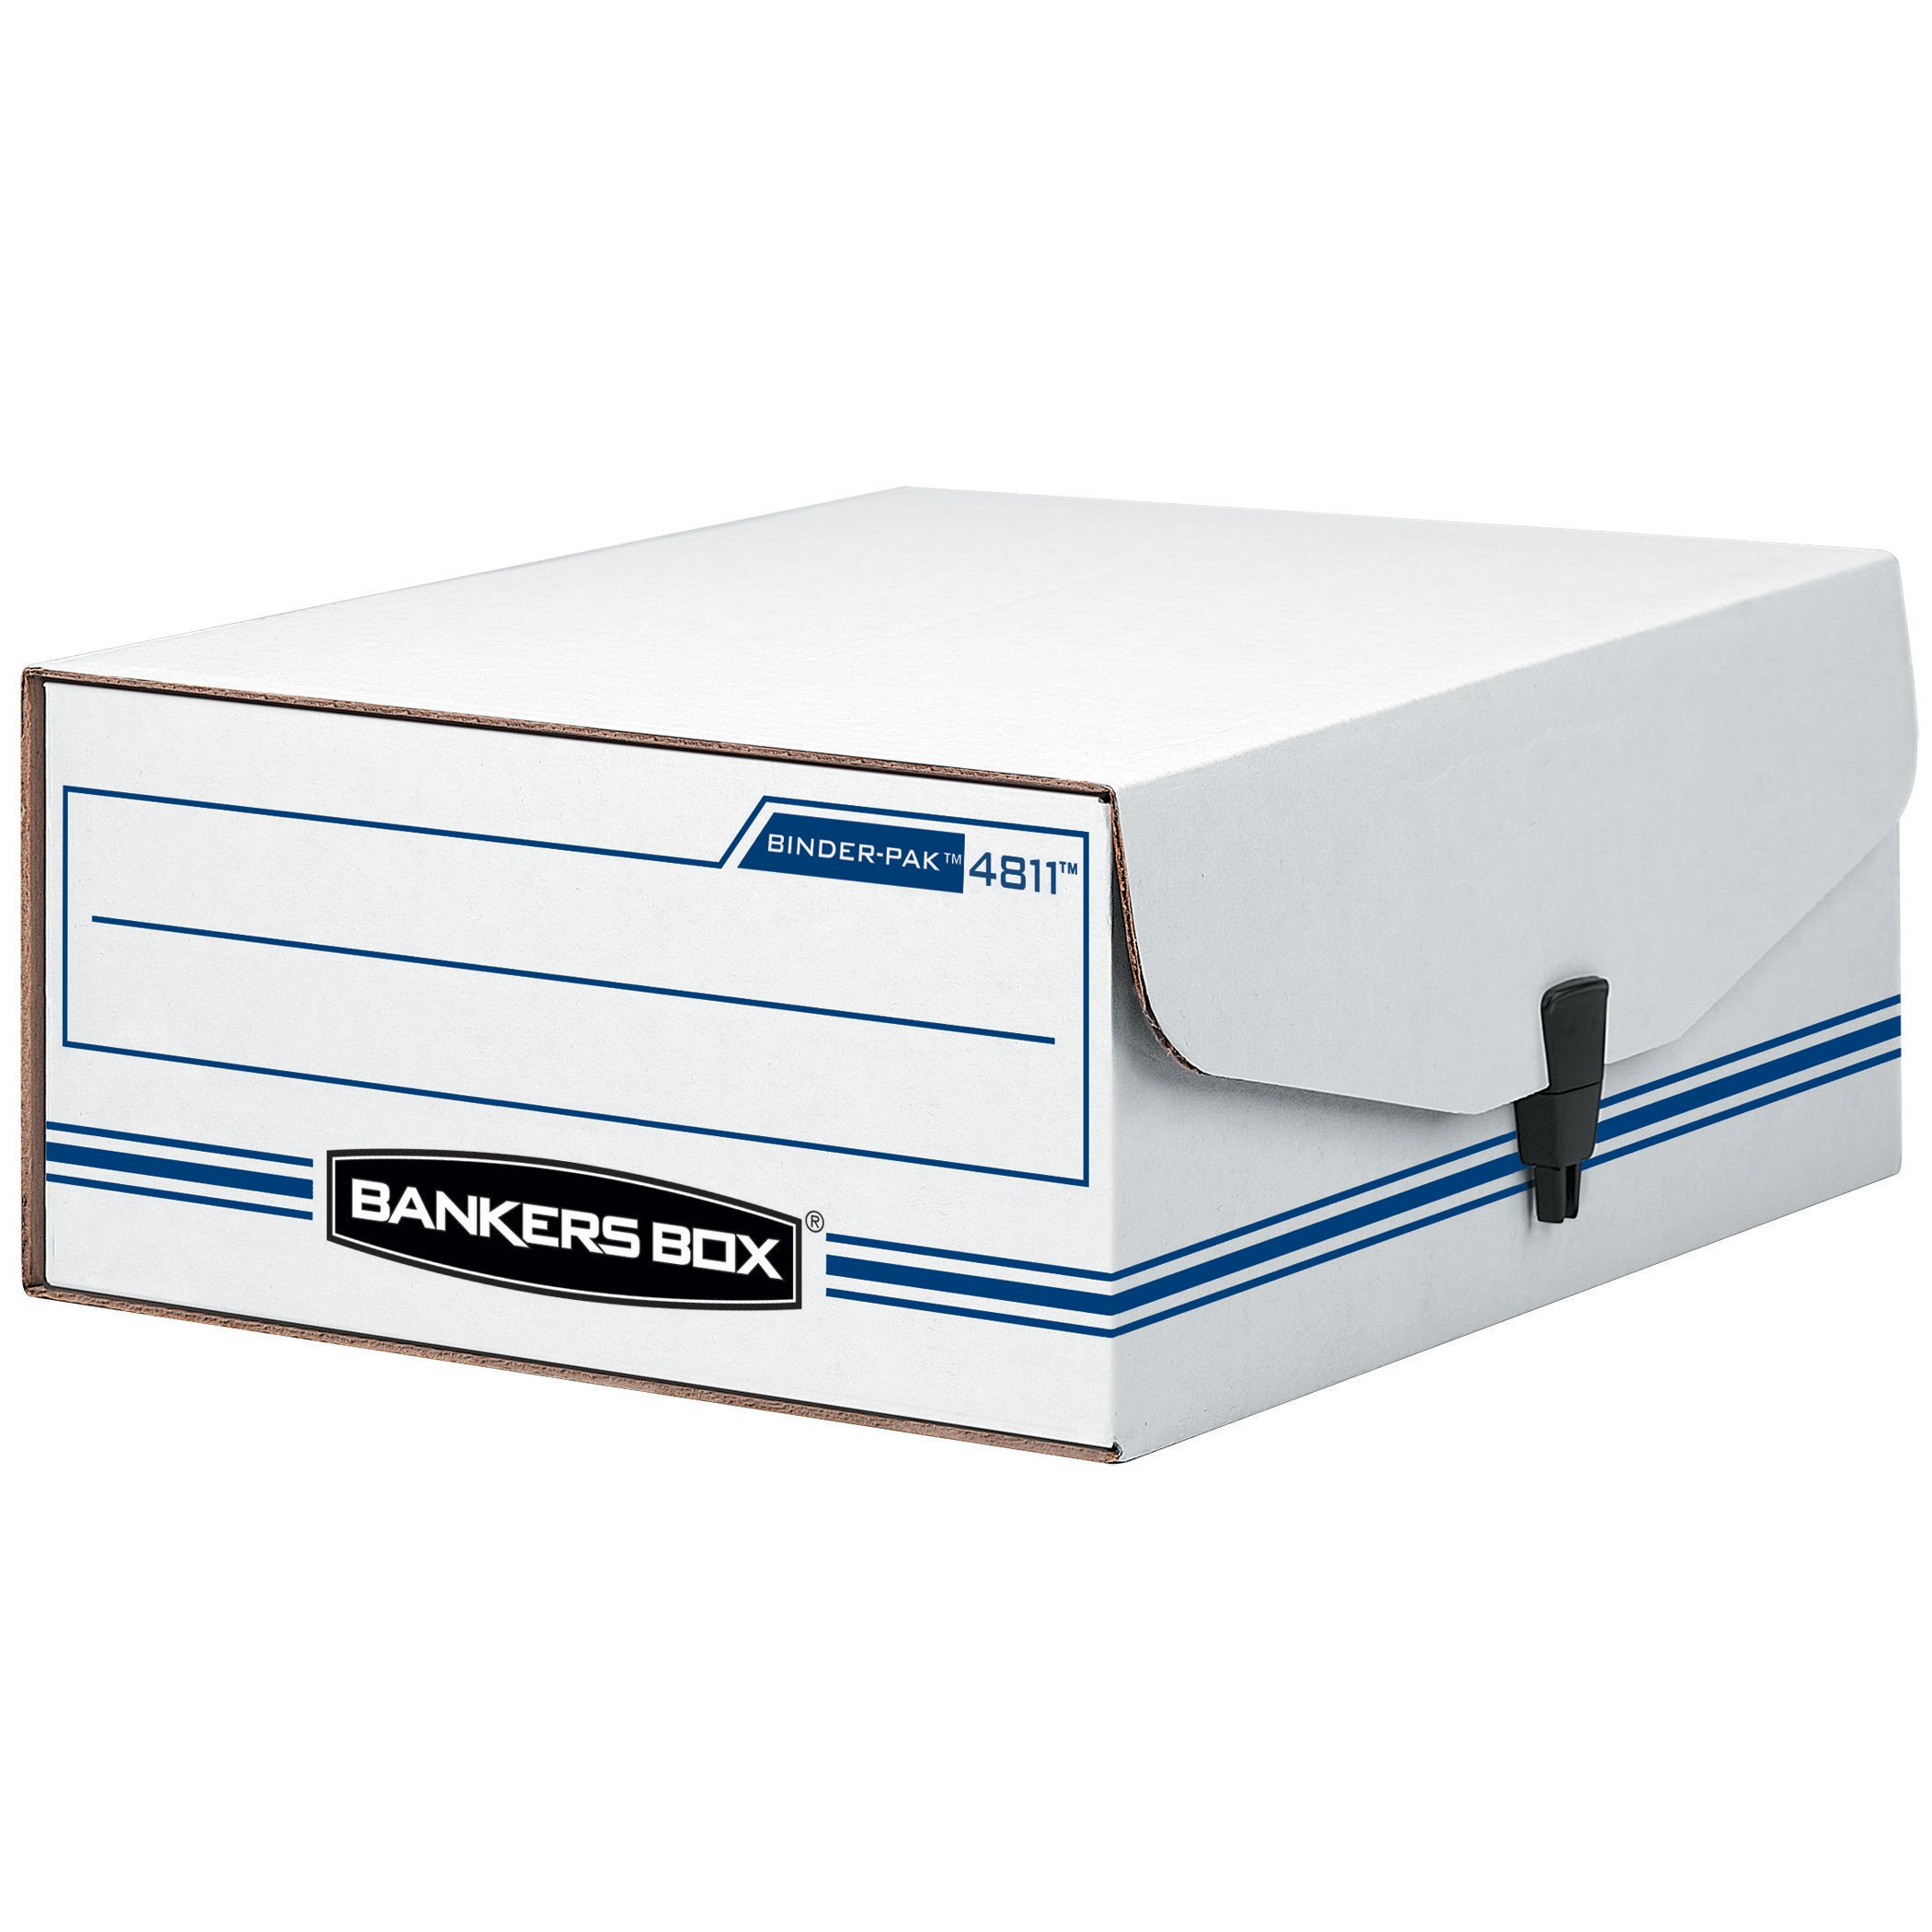 Fellowes Bankers Box Liberty 8 1/4 x 11 x 4 Inch Binder Pak (48110)